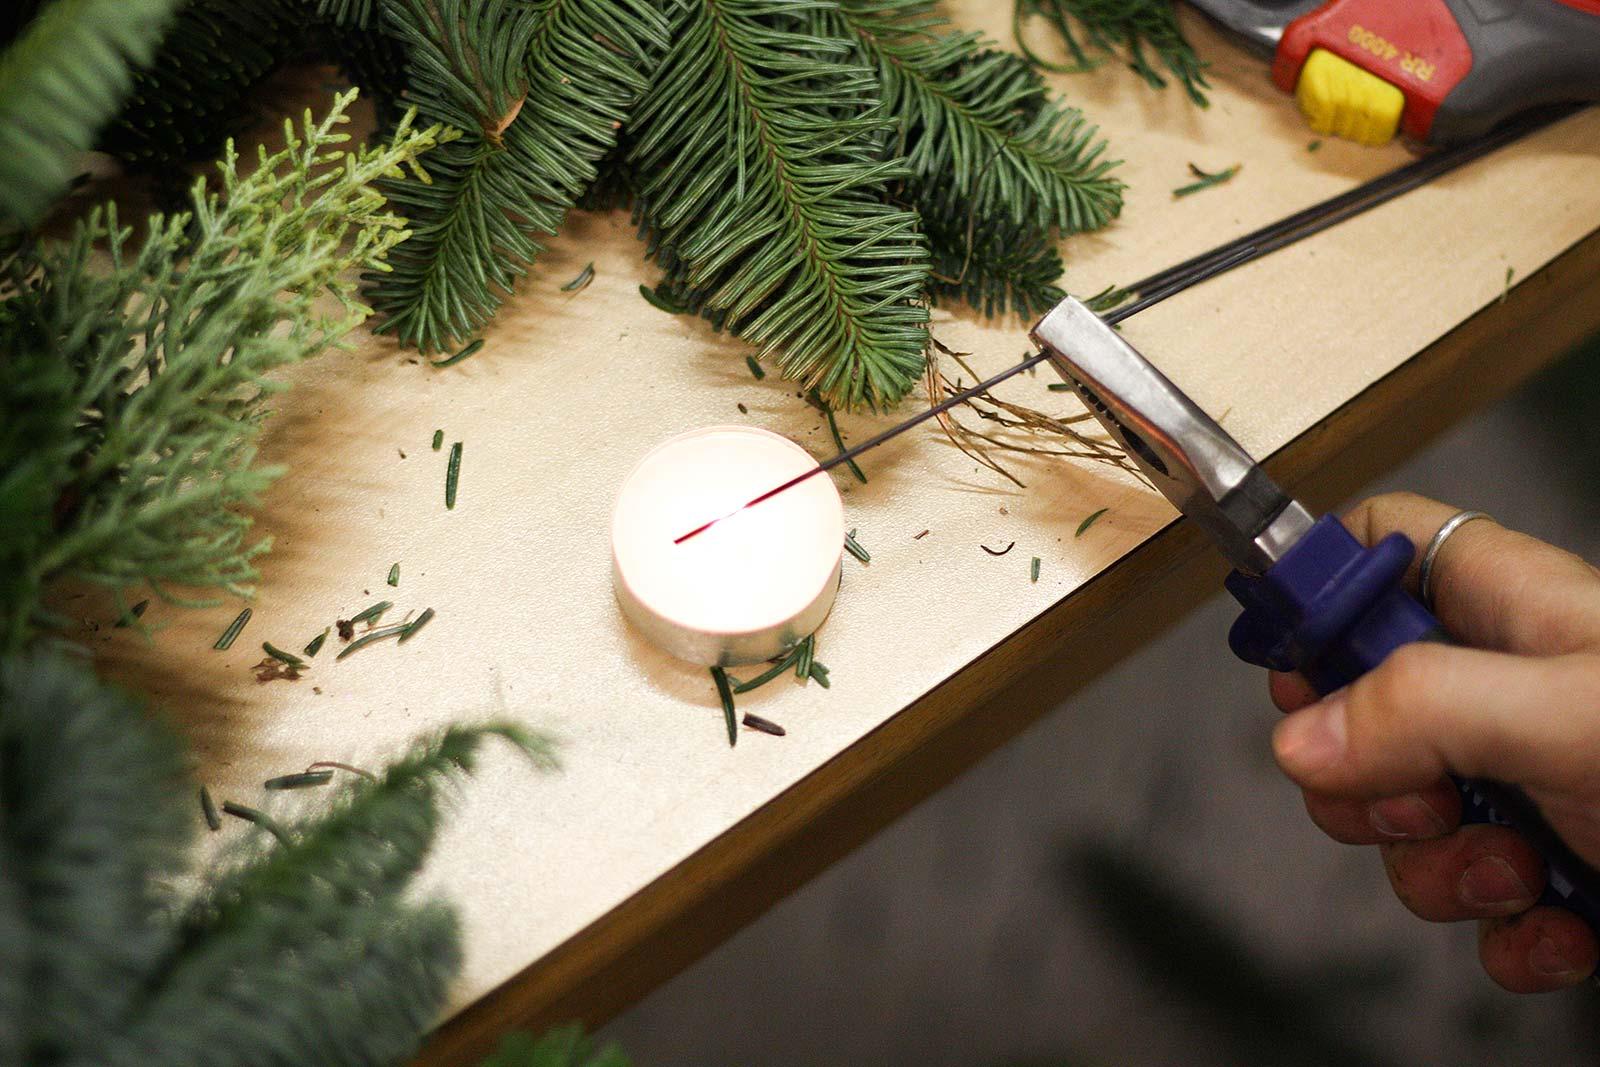 DIY-Adventskranz - Draht erhitzen